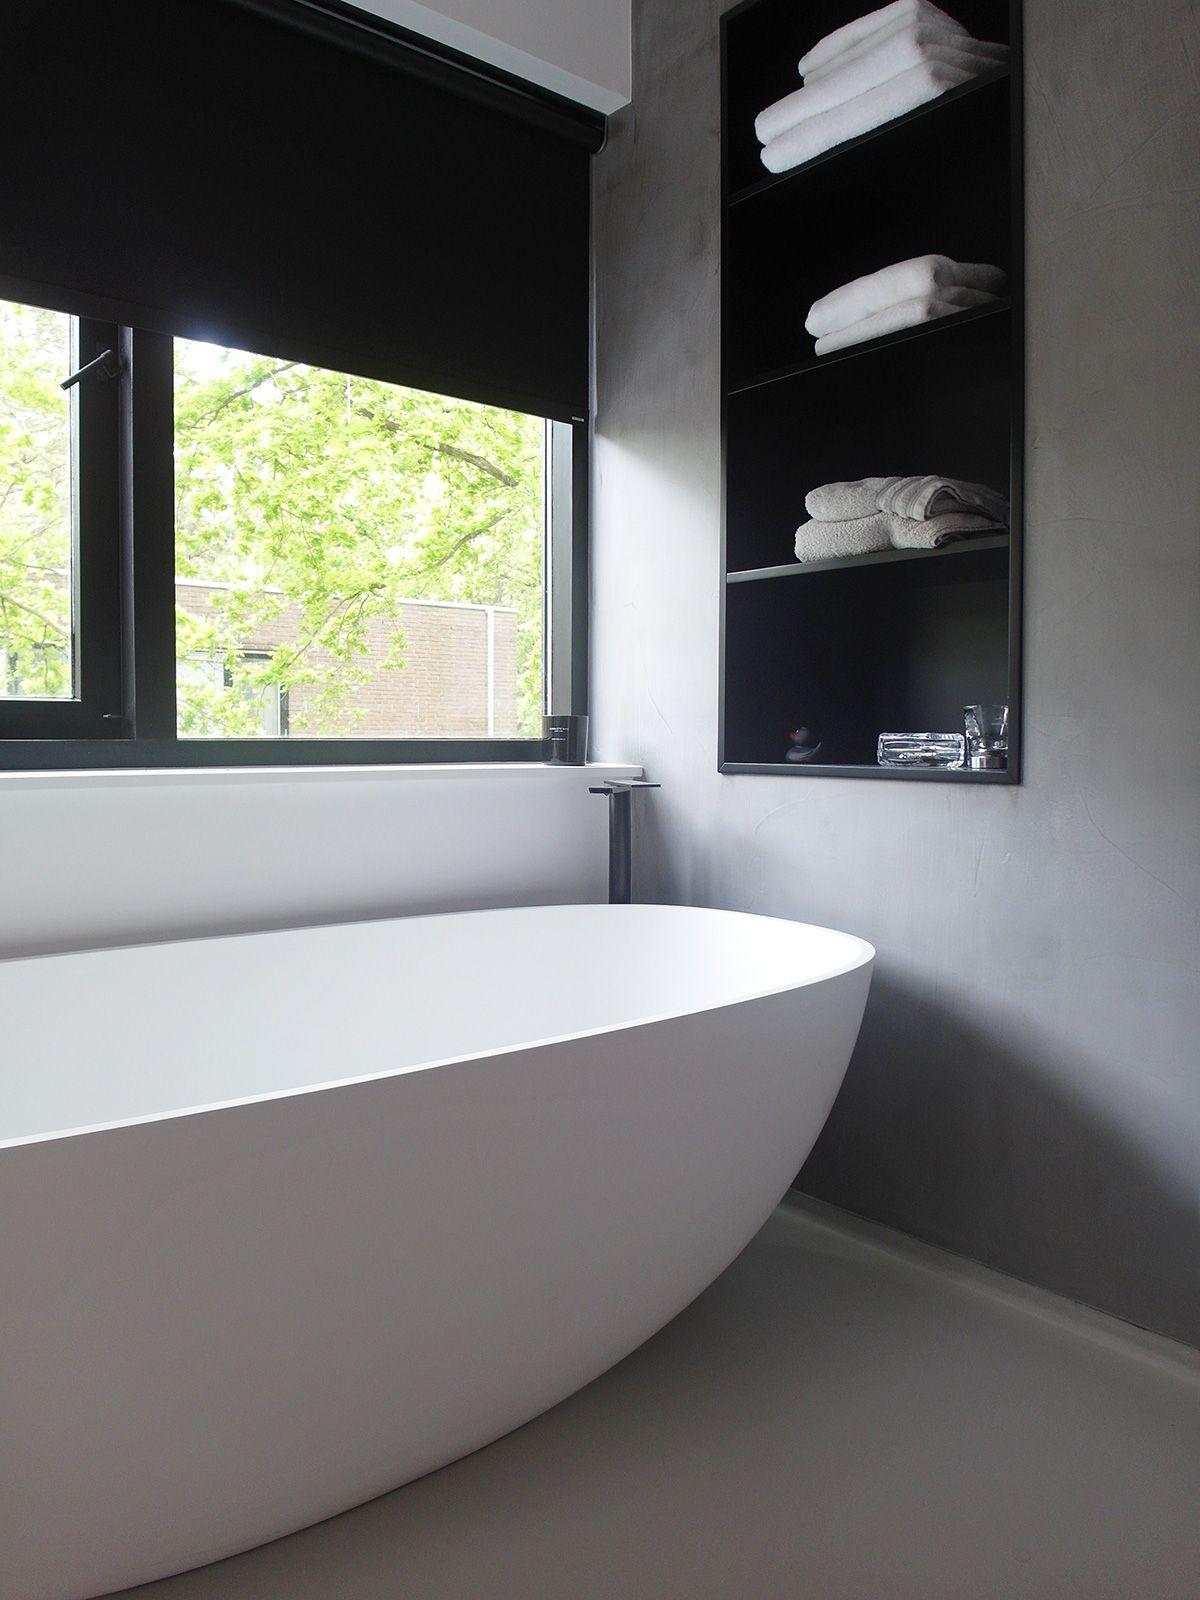 microcement badkamer wassenaar gietvloer wit grijs gietvloer